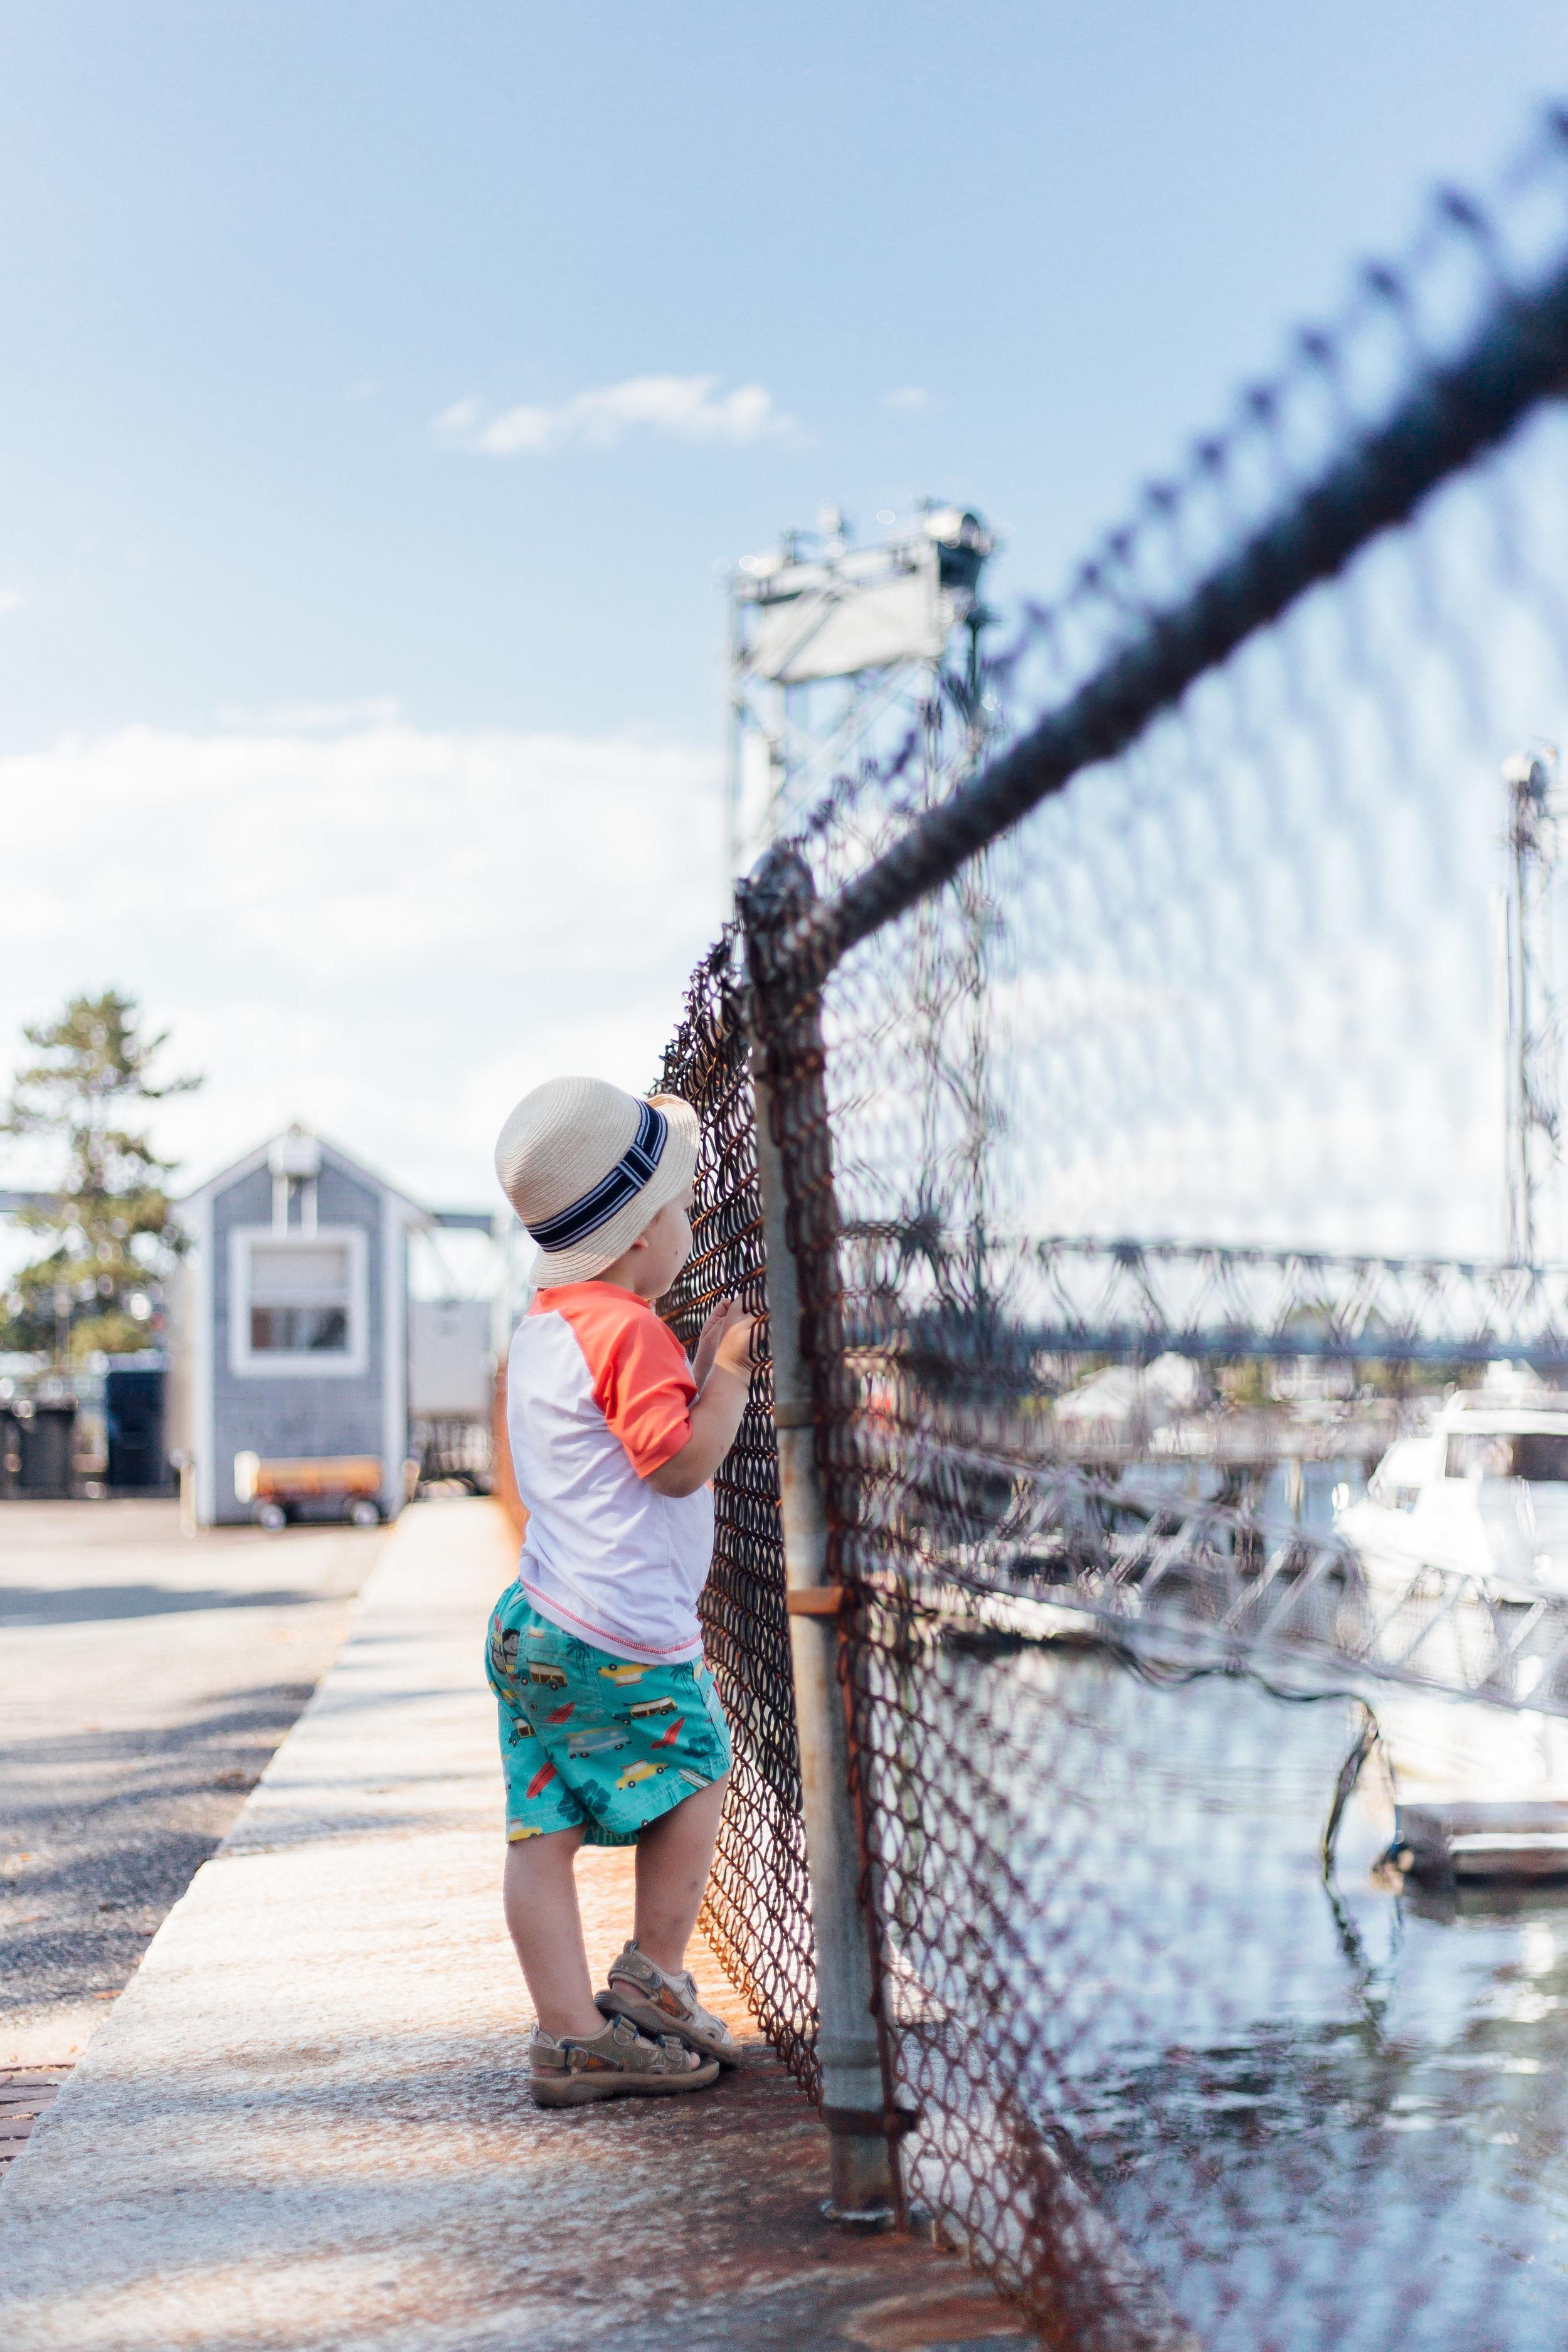 Little Boy Watching Boats